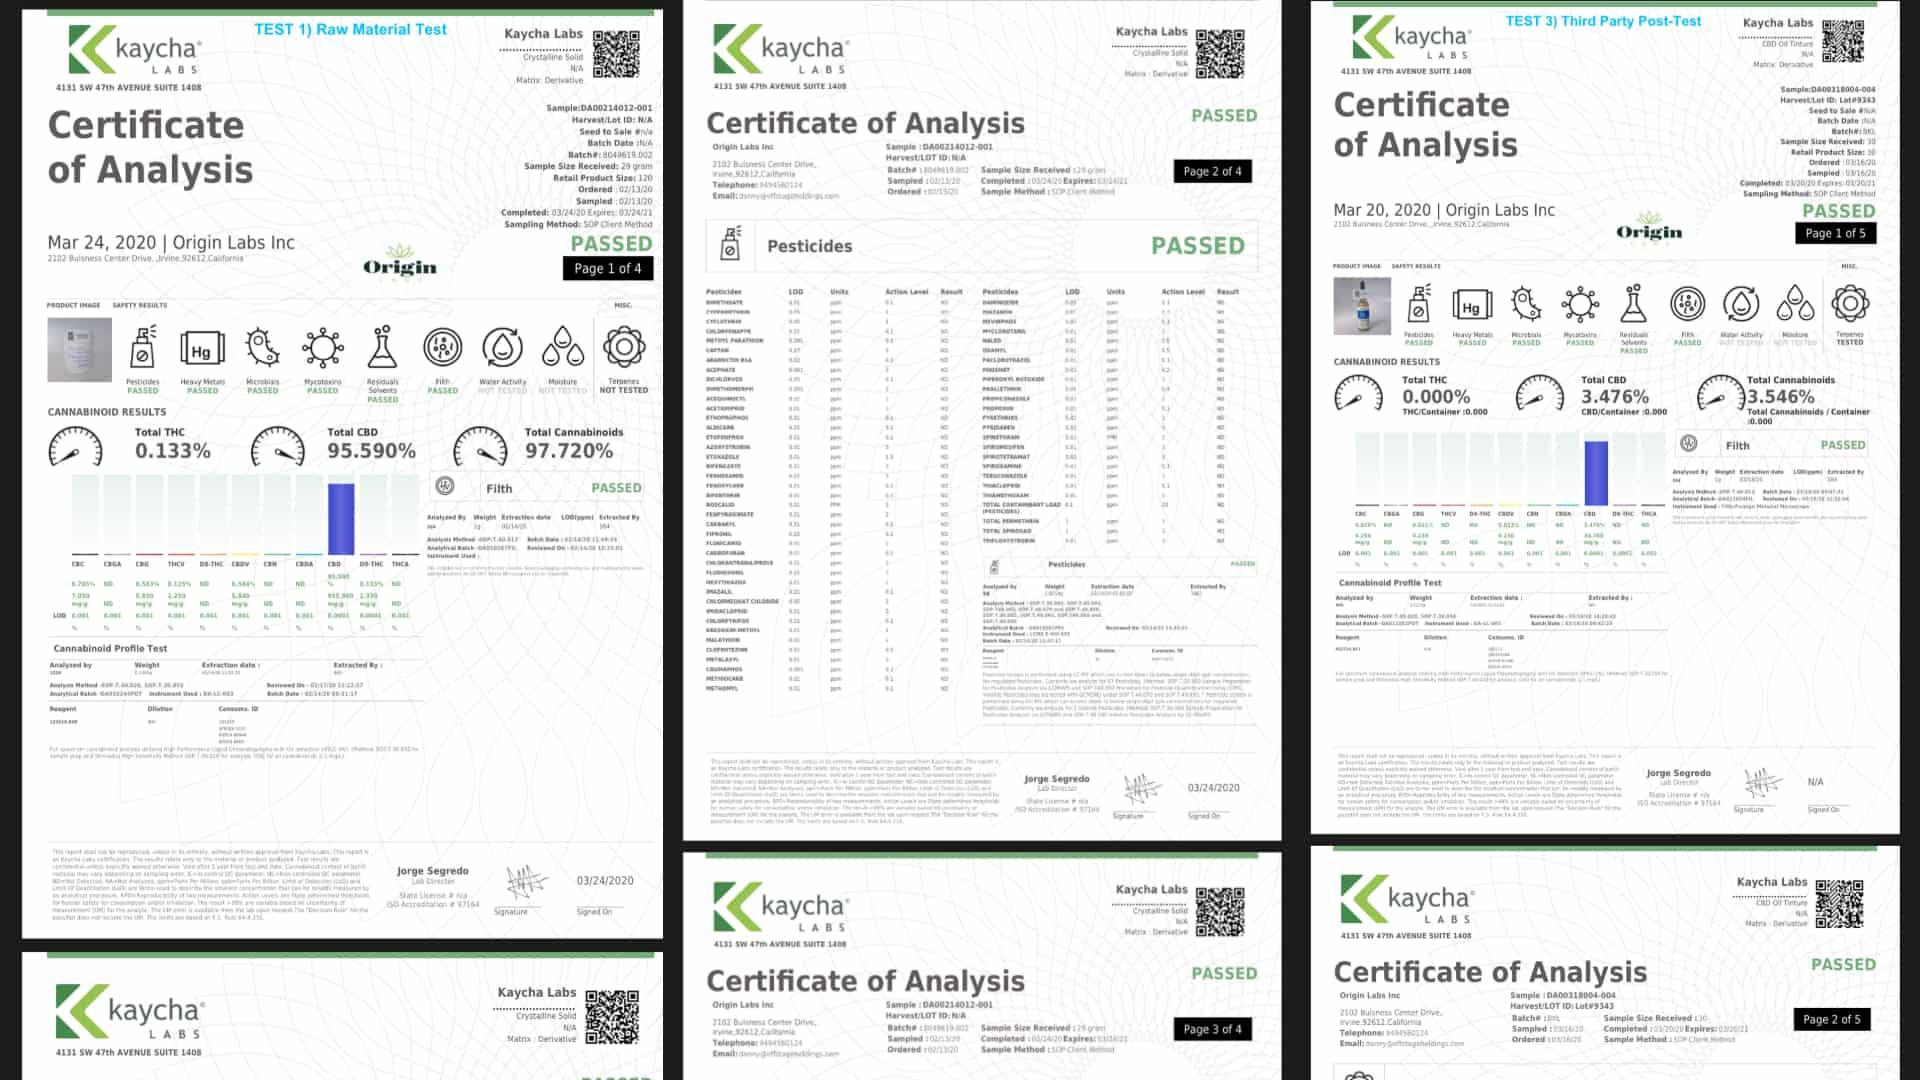 pearlcbd lab test results